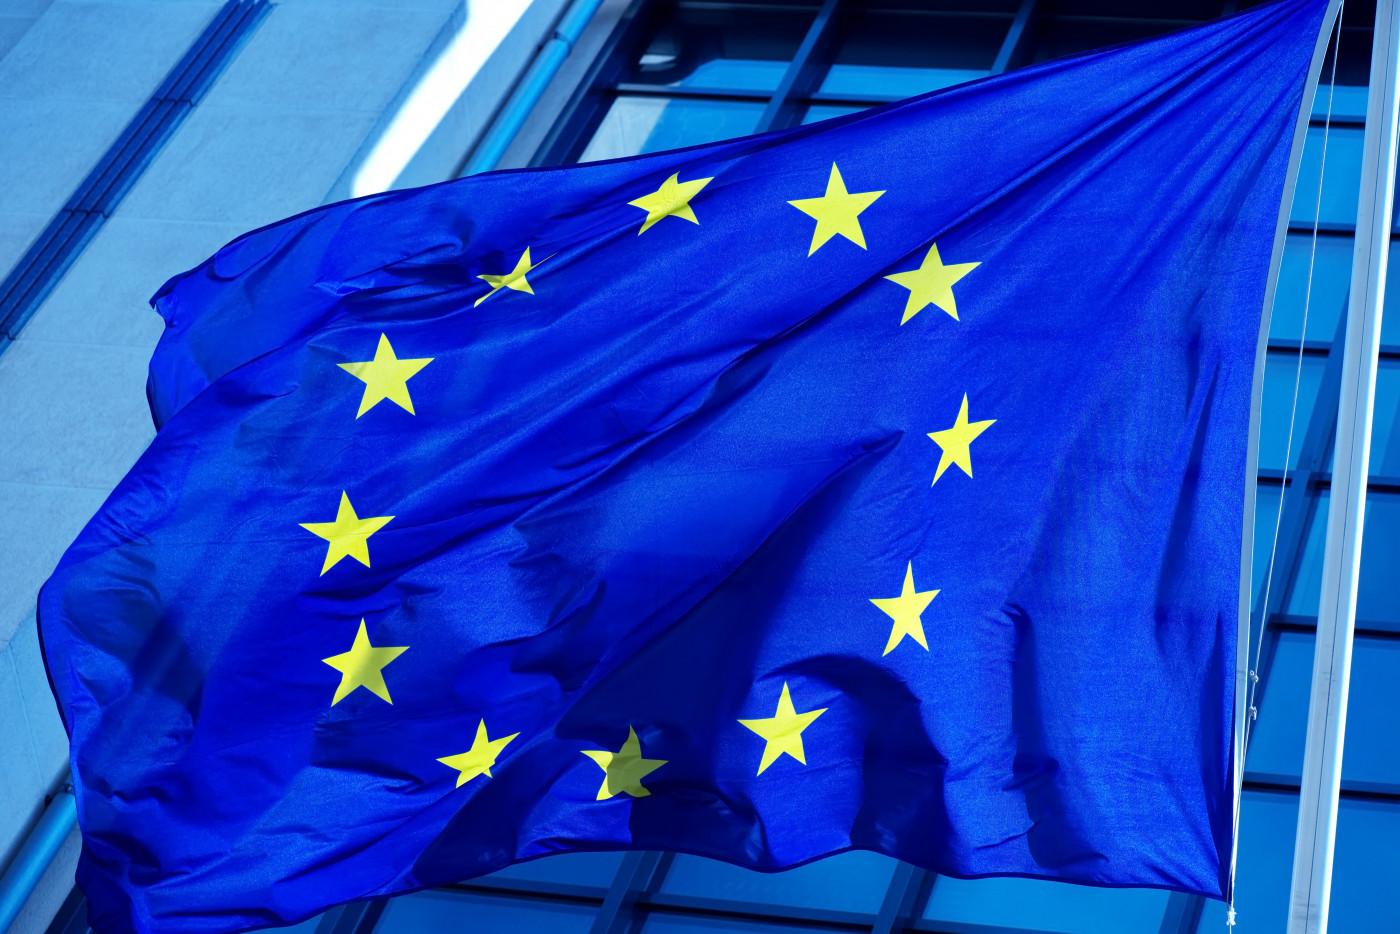 Enhertu, EU conditional approval